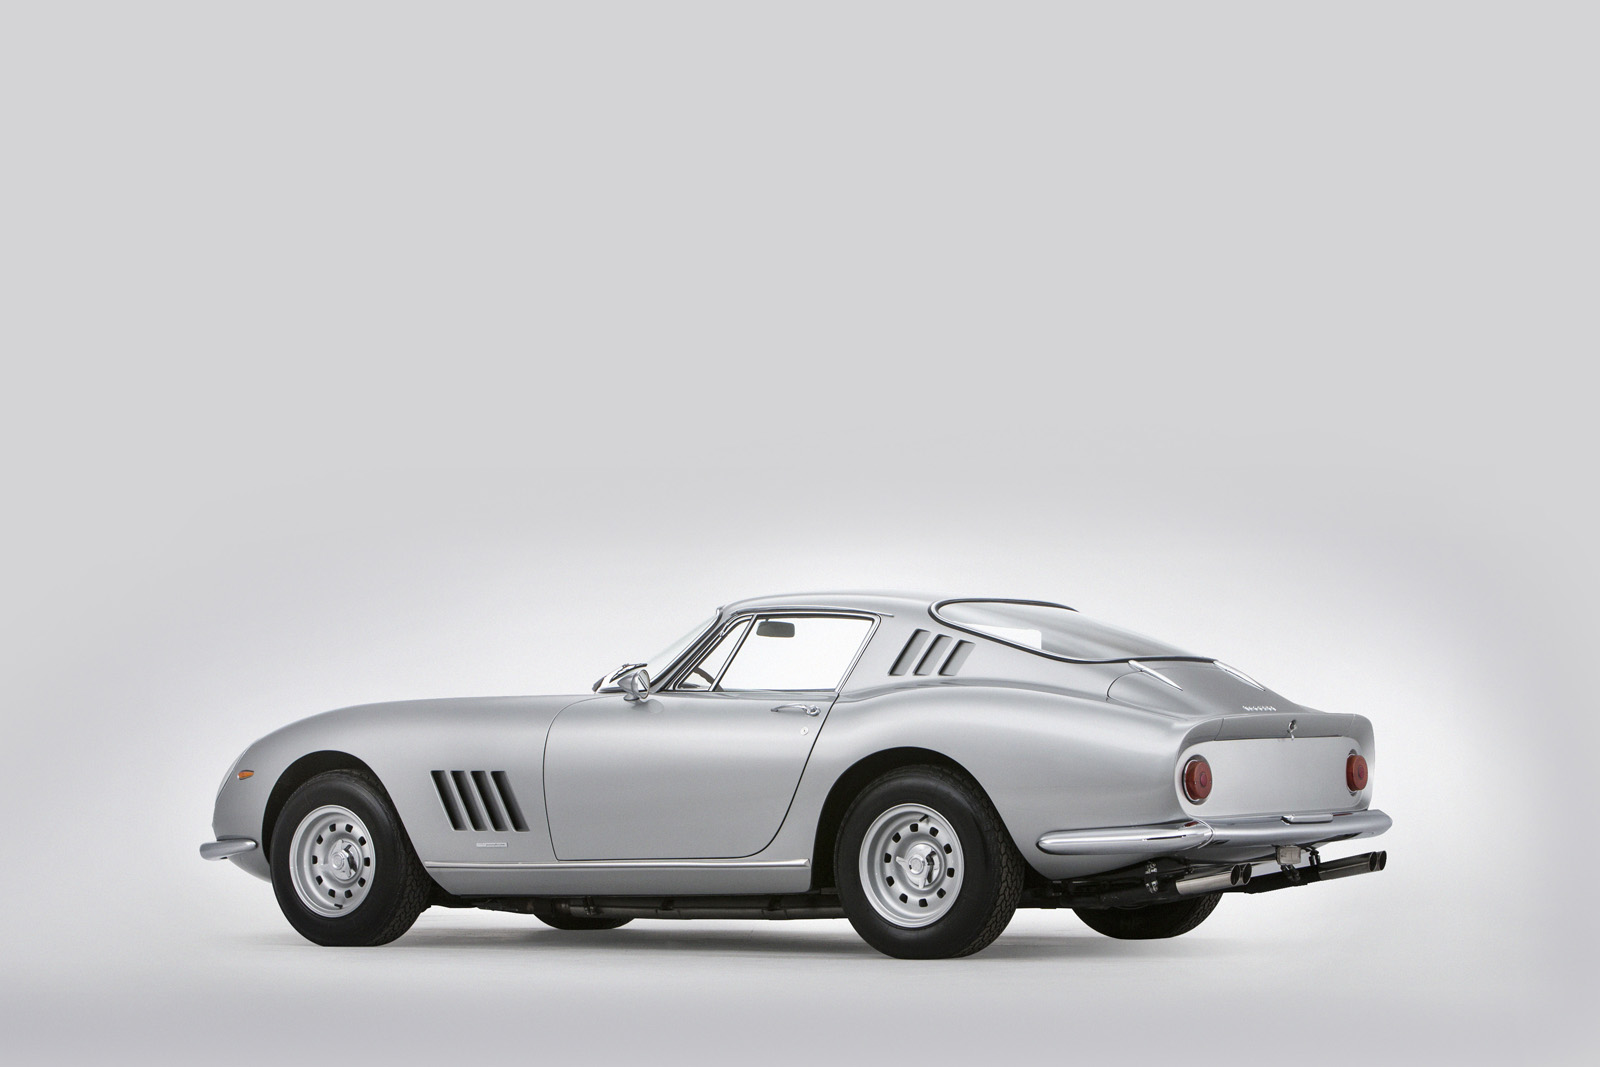 Ferrari275_3quartersrear.jpg